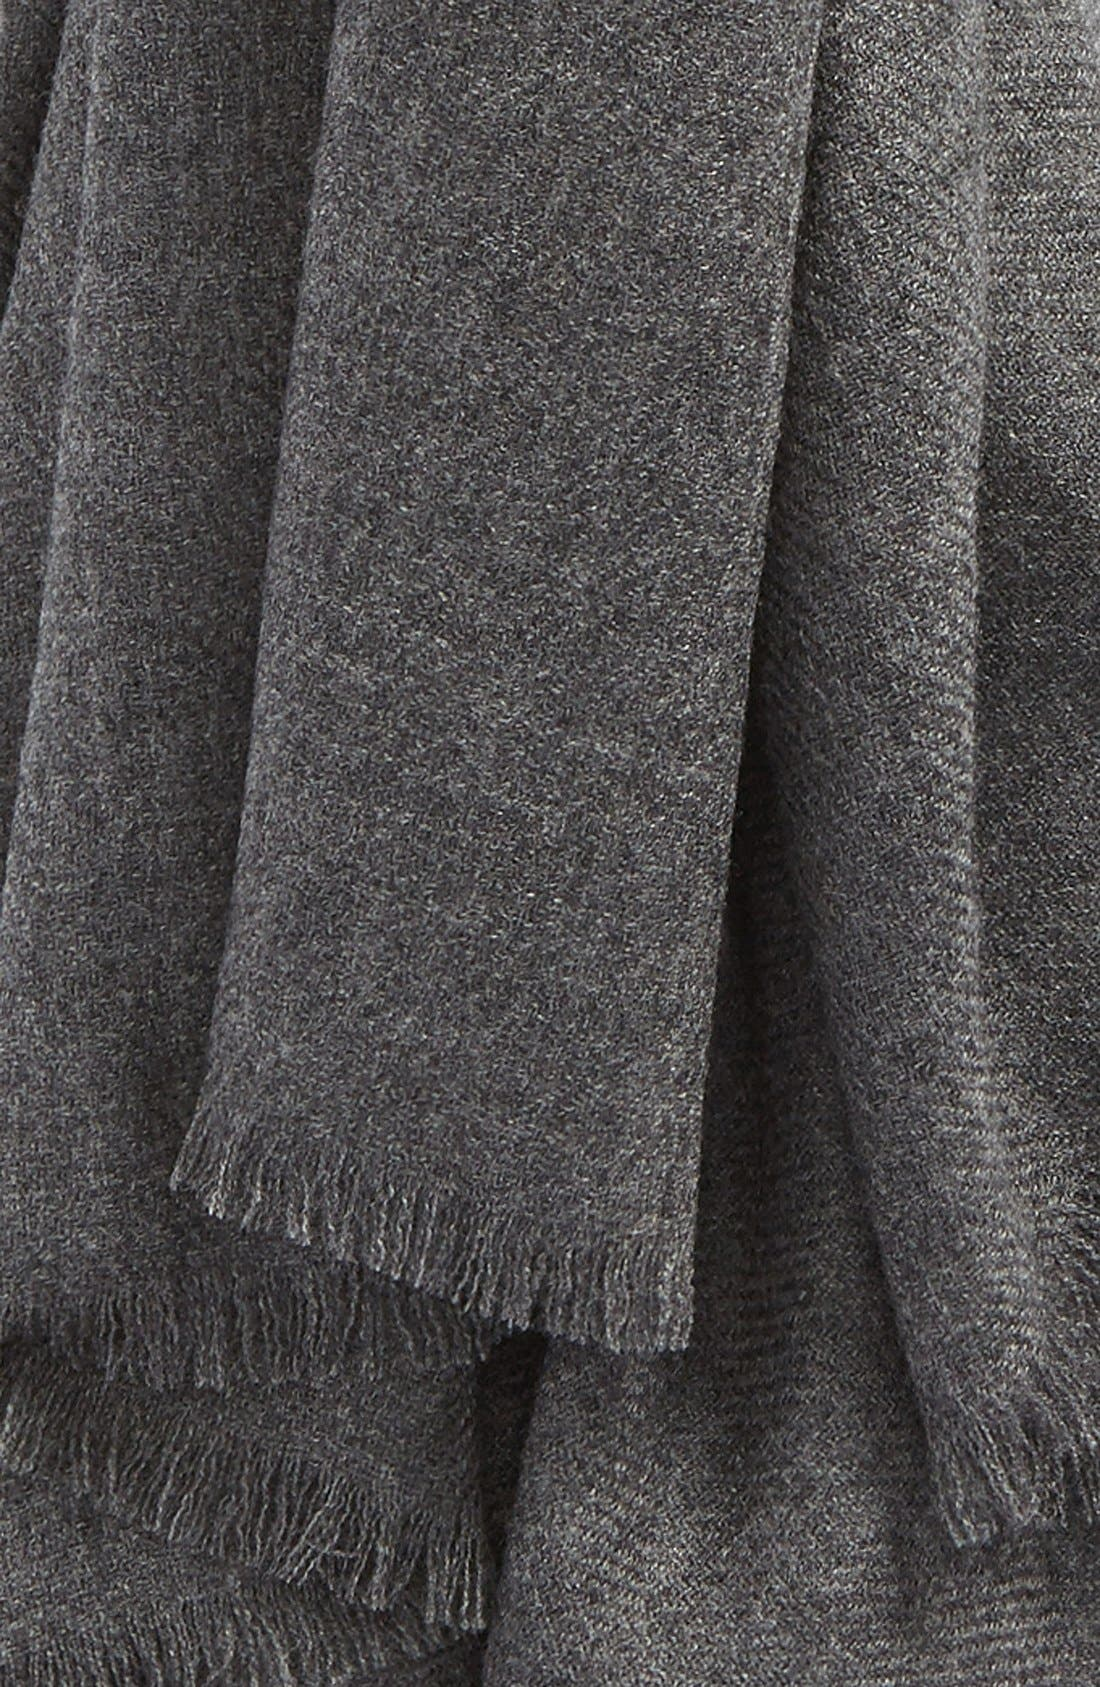 Wool & Cashmere Wrap,                             Alternate thumbnail 45, color,